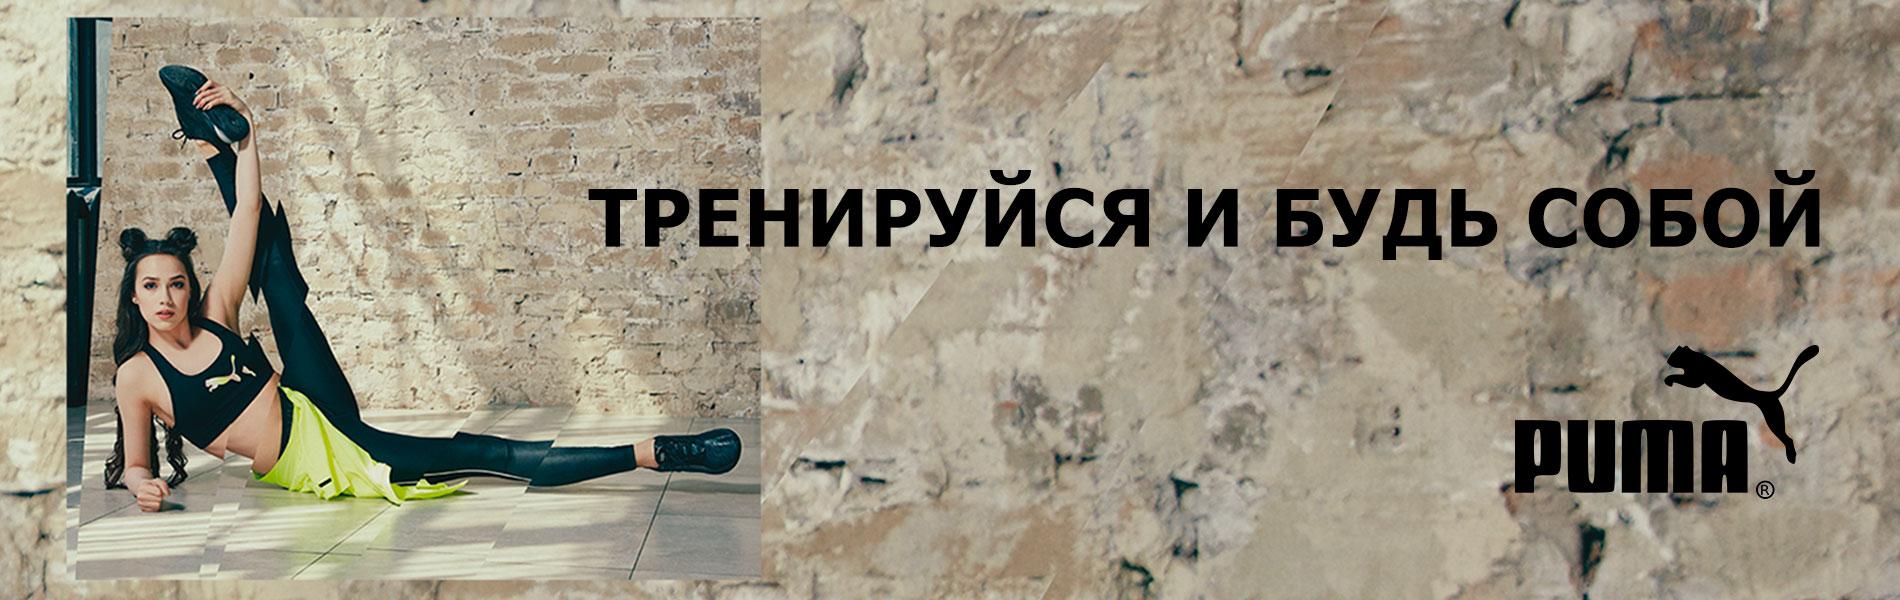 Алина Загитова амбассадор Puma